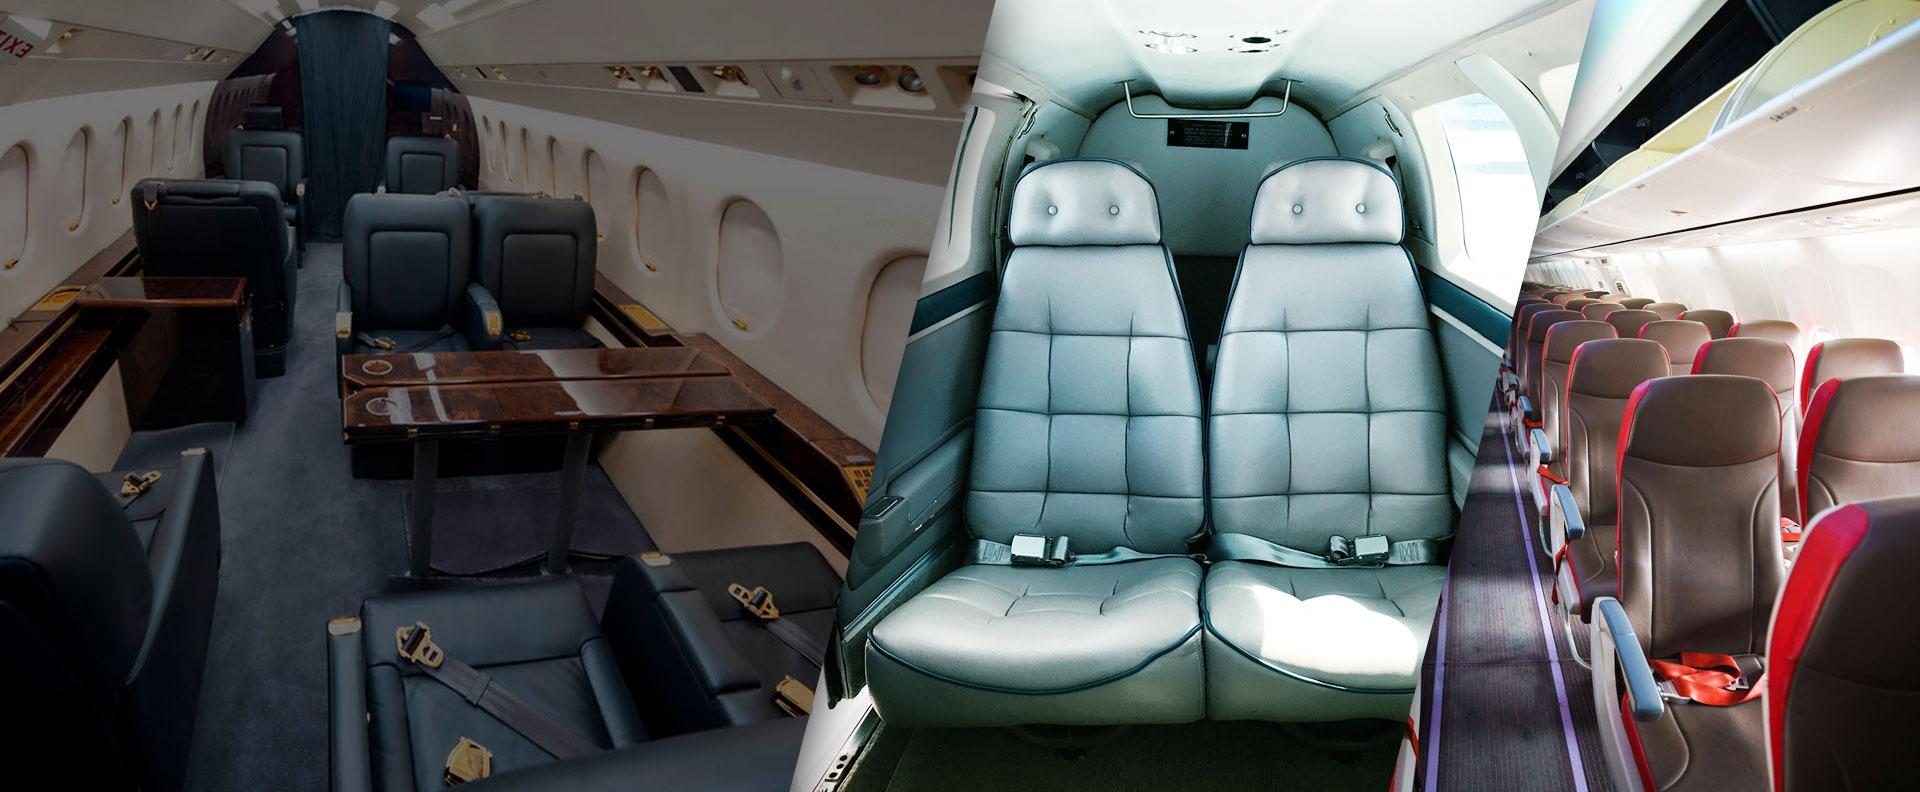 aircraft-upholstery.jpg